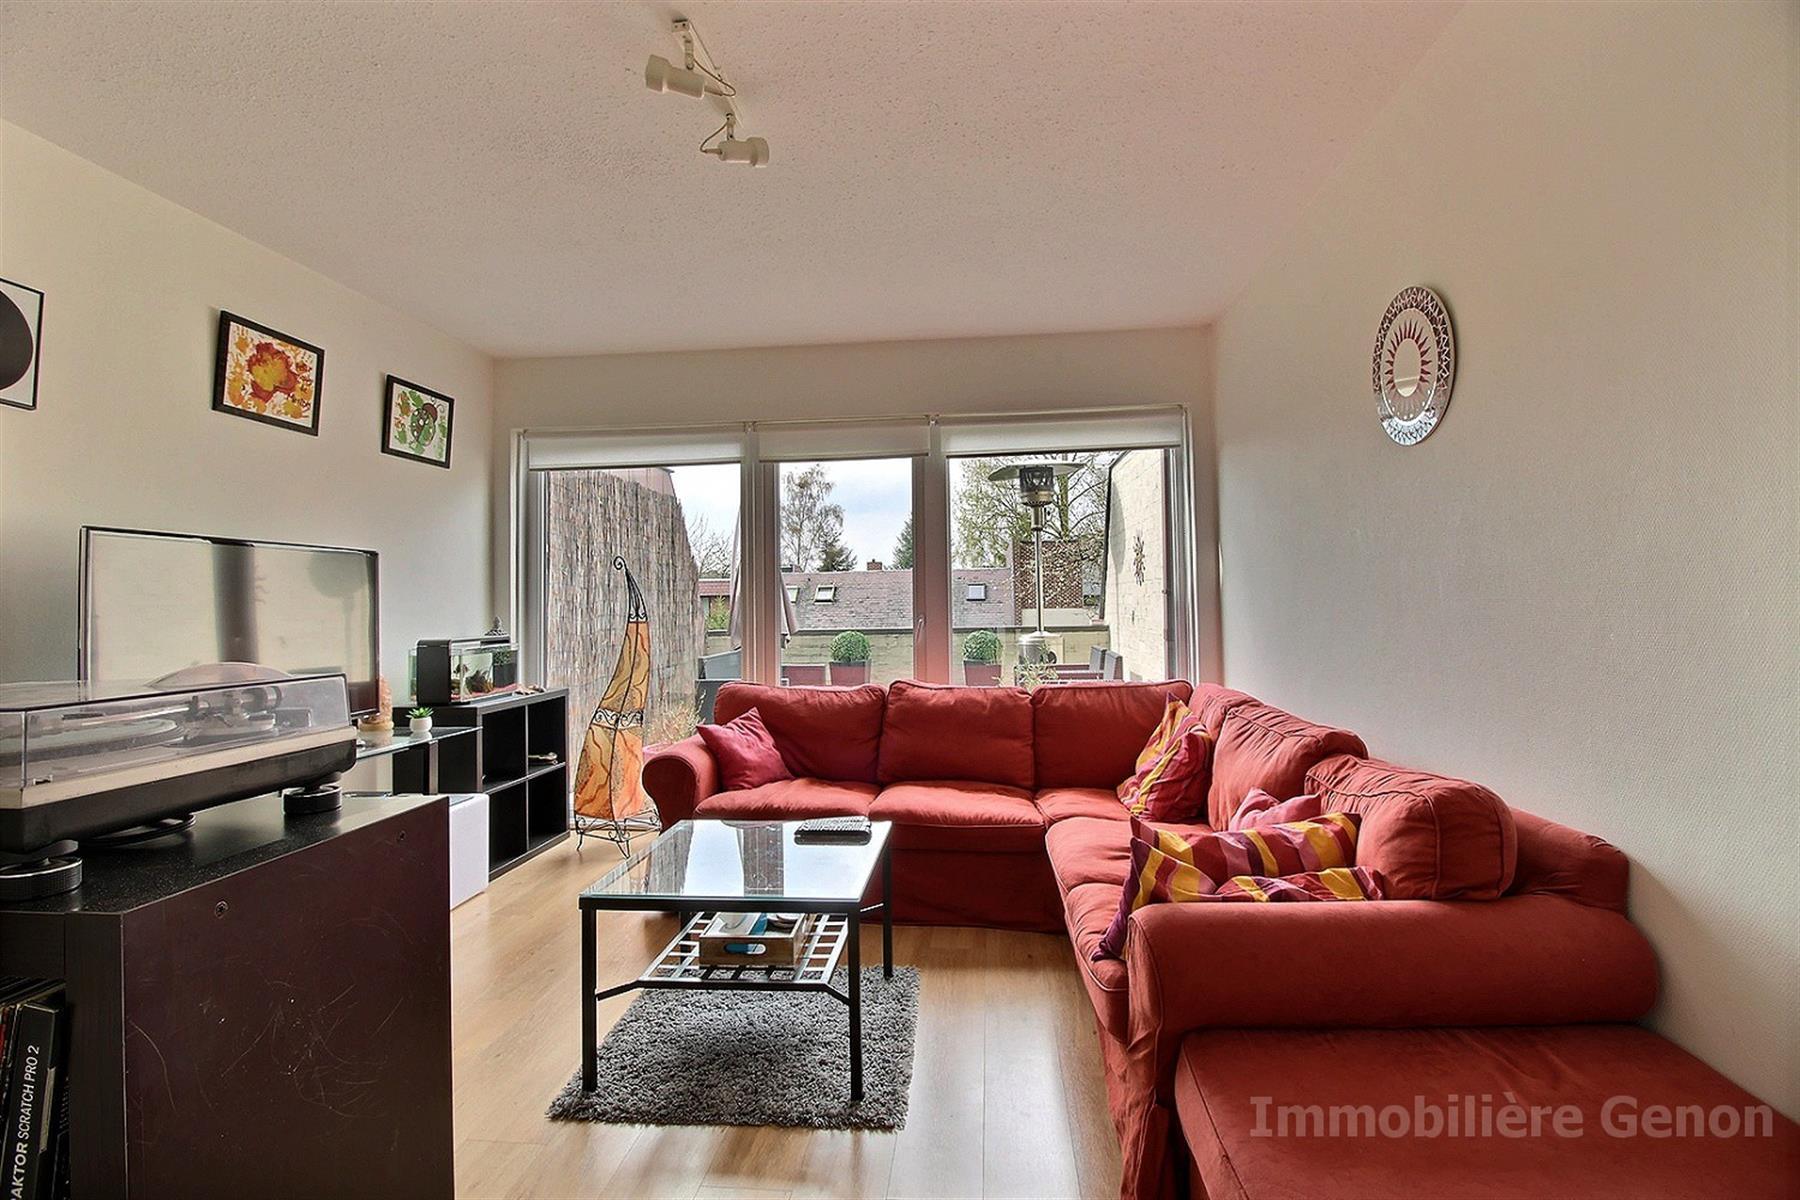 Maison - Ottignies-Louvain-la-Neuve - #4532084-6